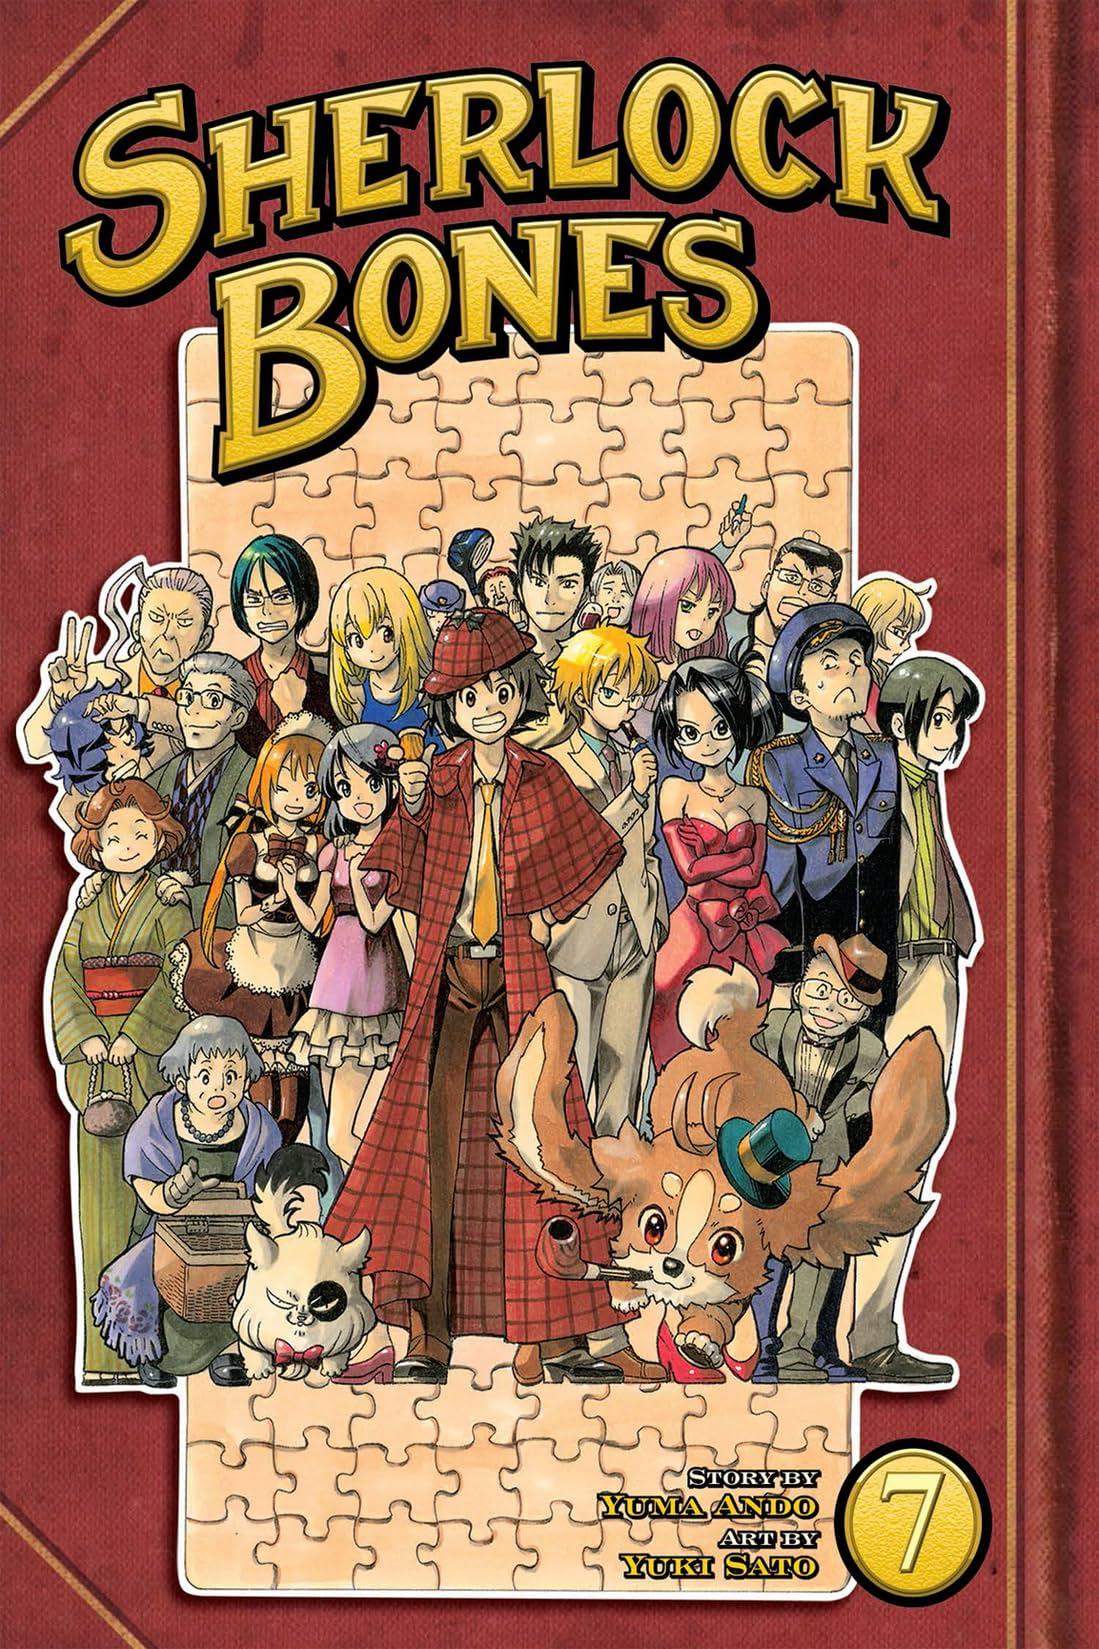 Sherlock Bones Vol. 7